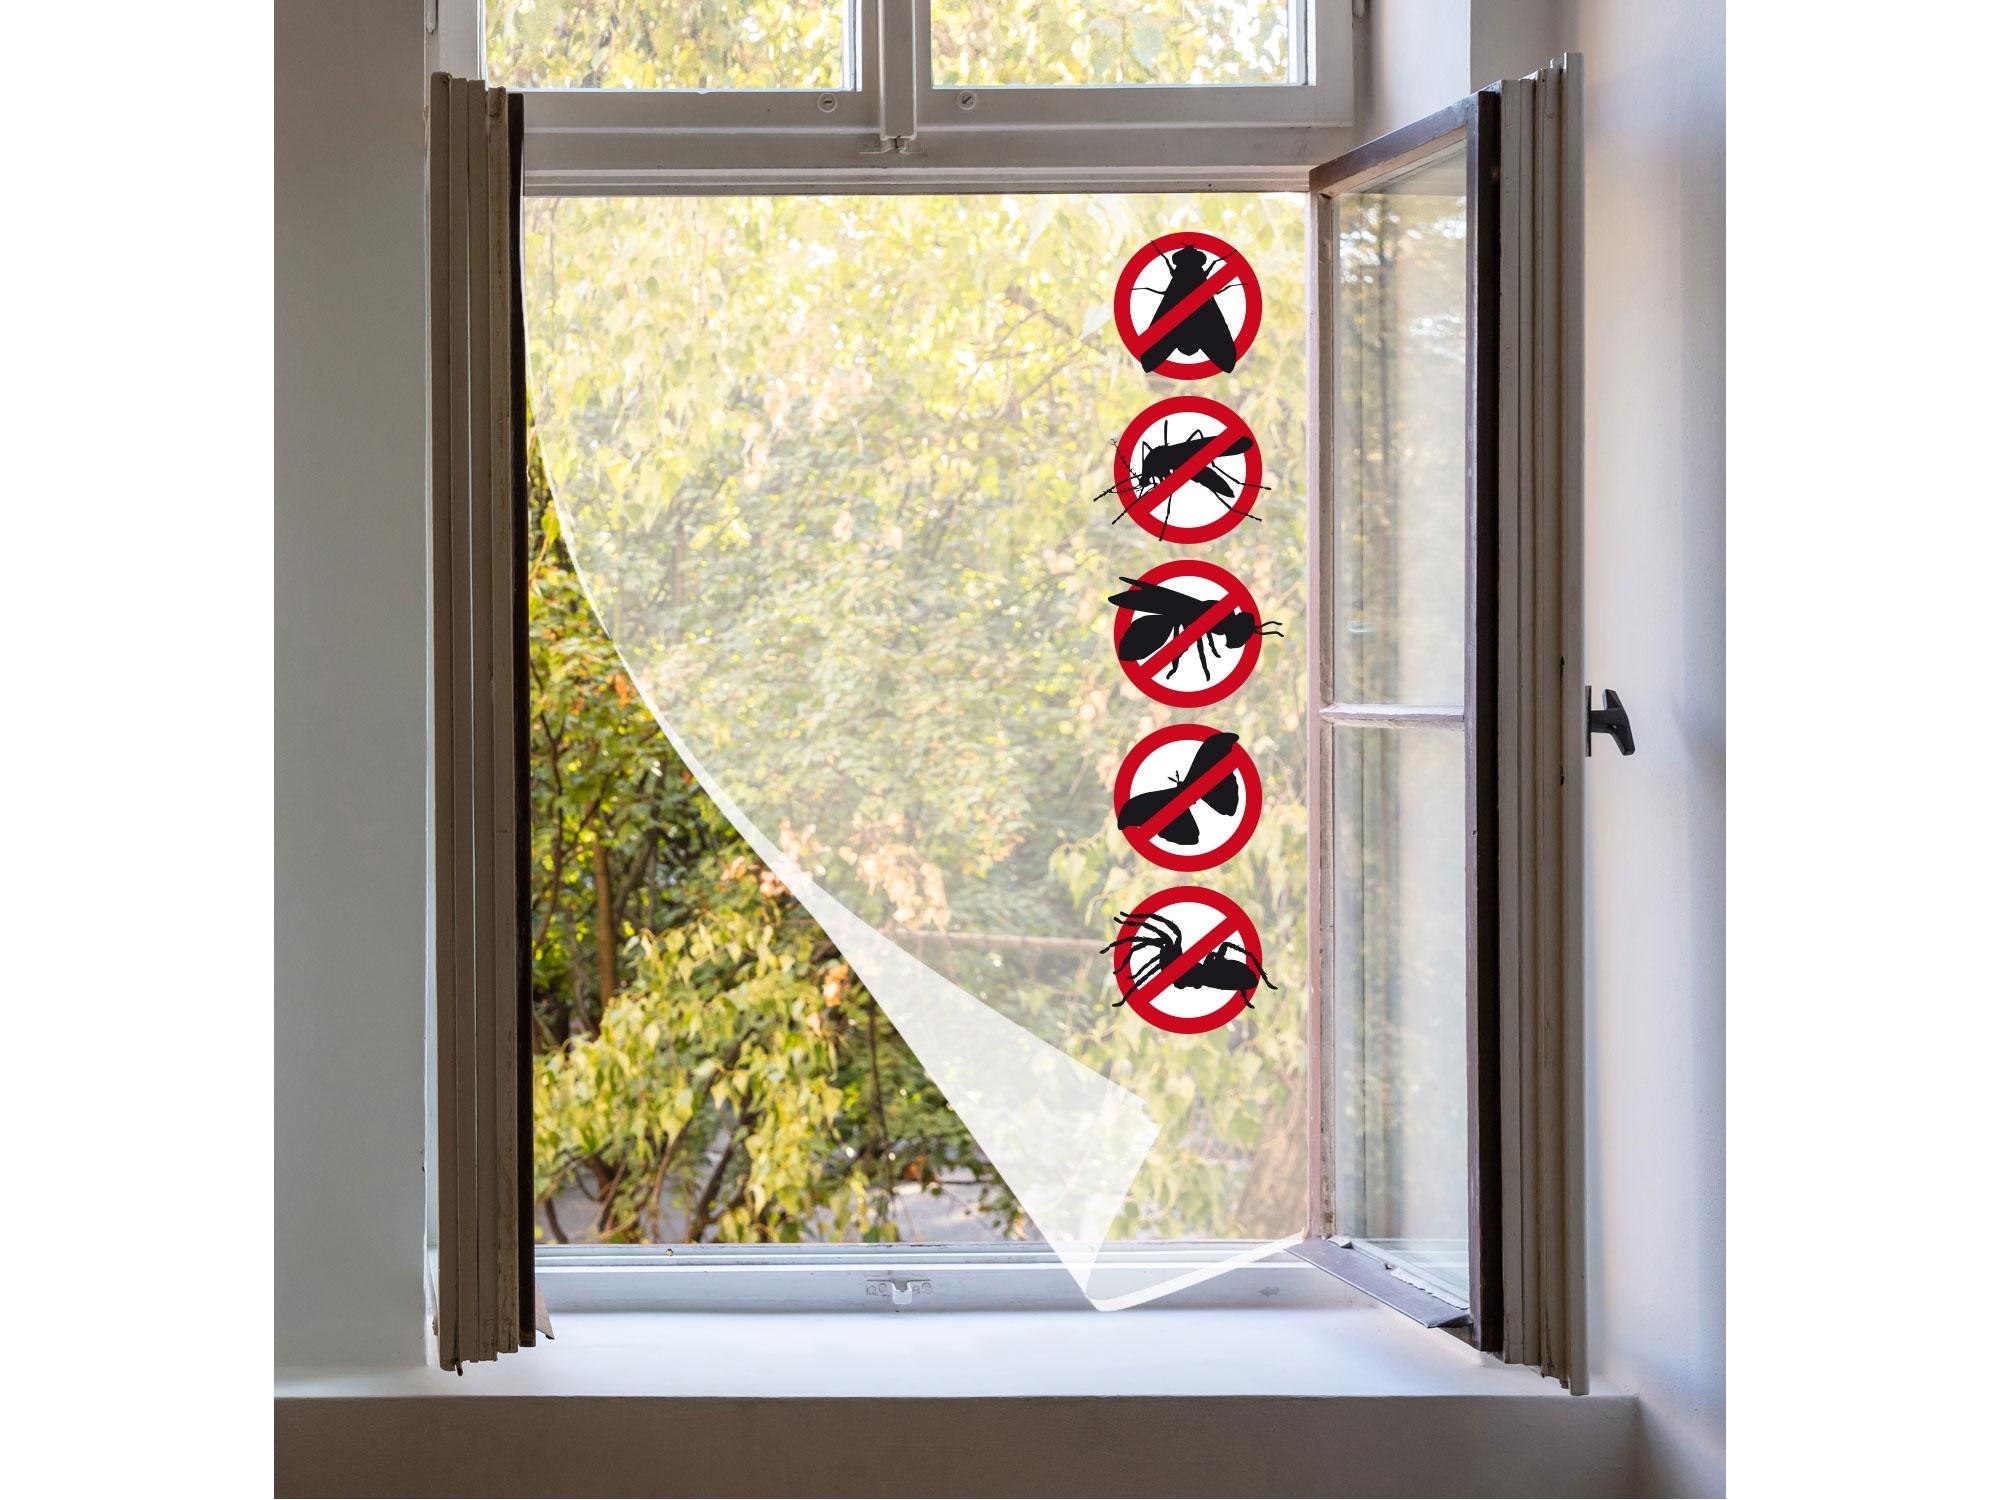 síť okenní proti hmyzu, 90x150cm, bílá, PES